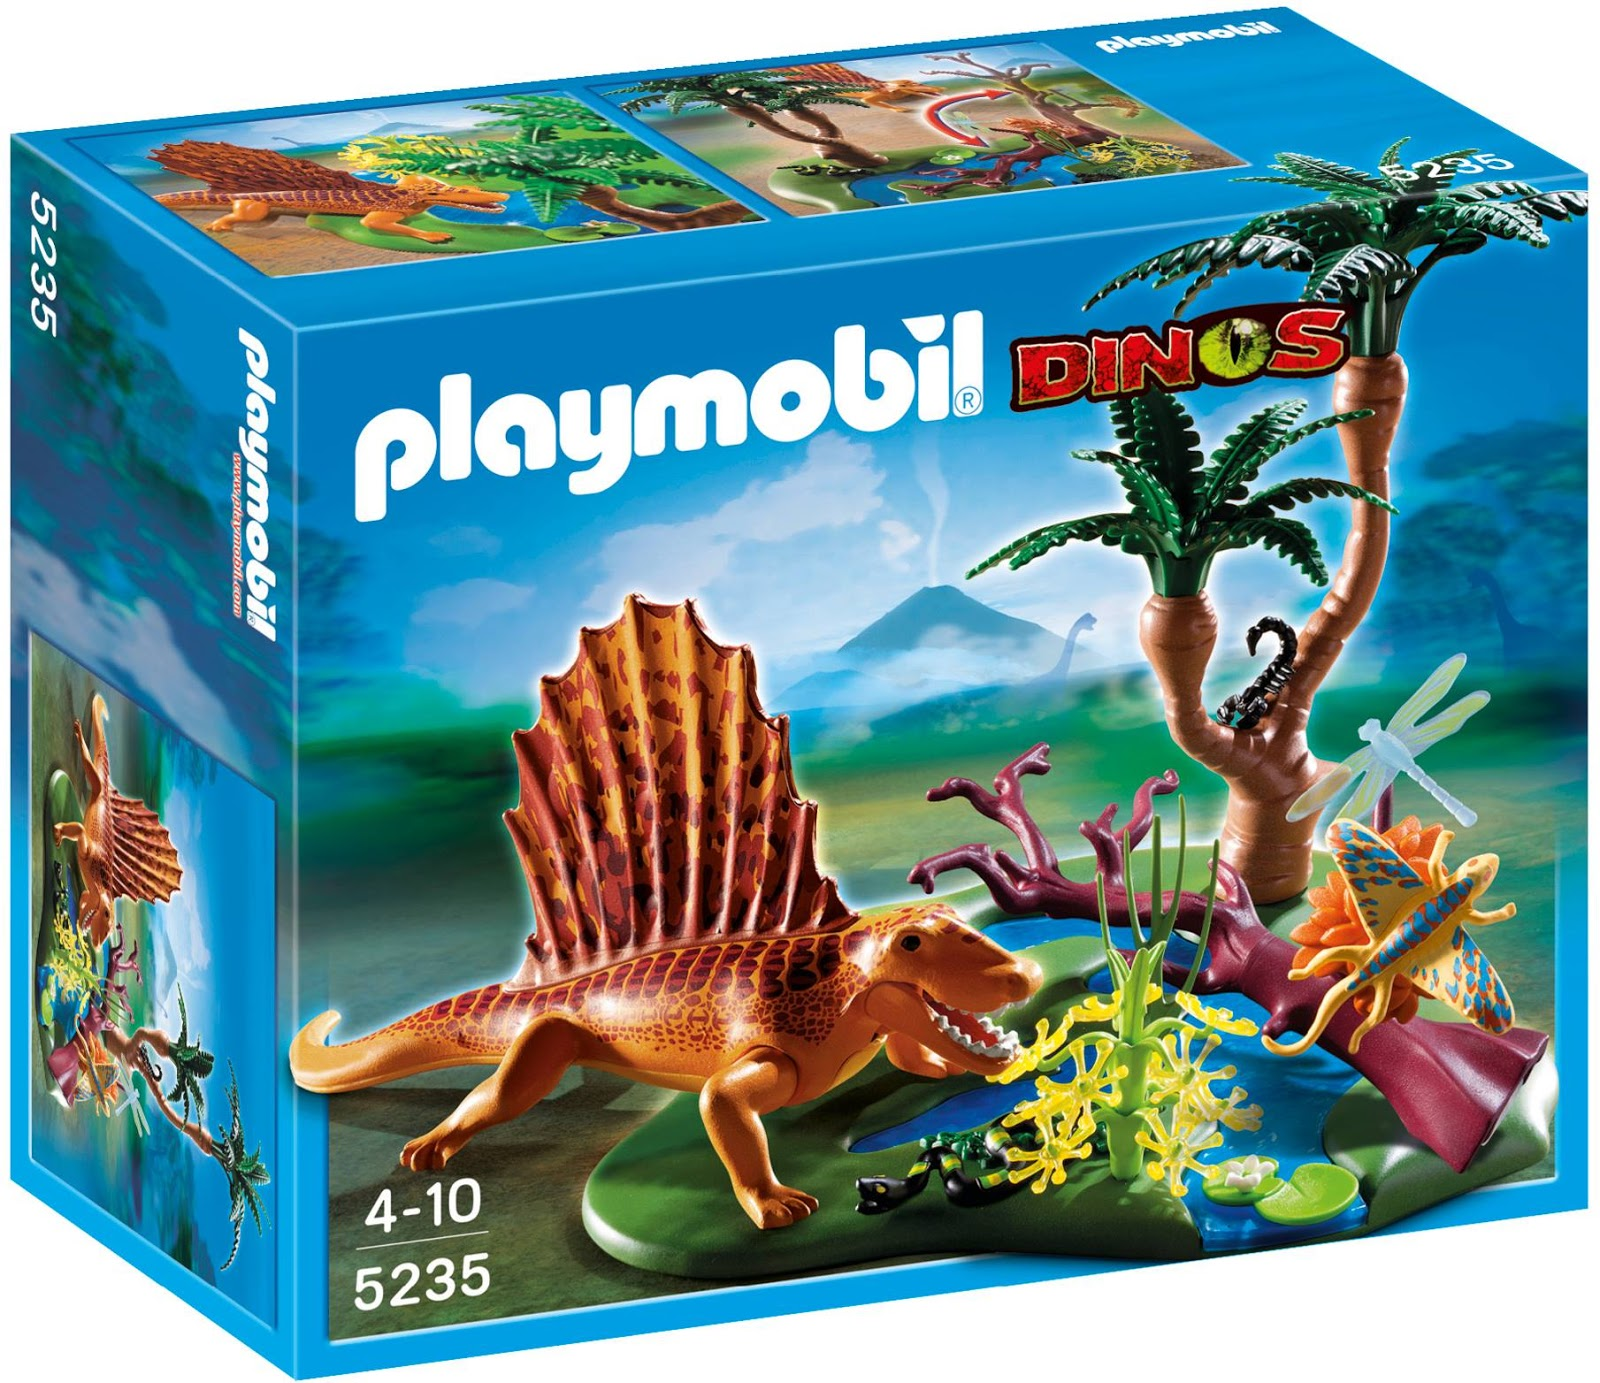 Playmobil barcelona y lego barcelona espa a venta for Playmobil dinosaurios